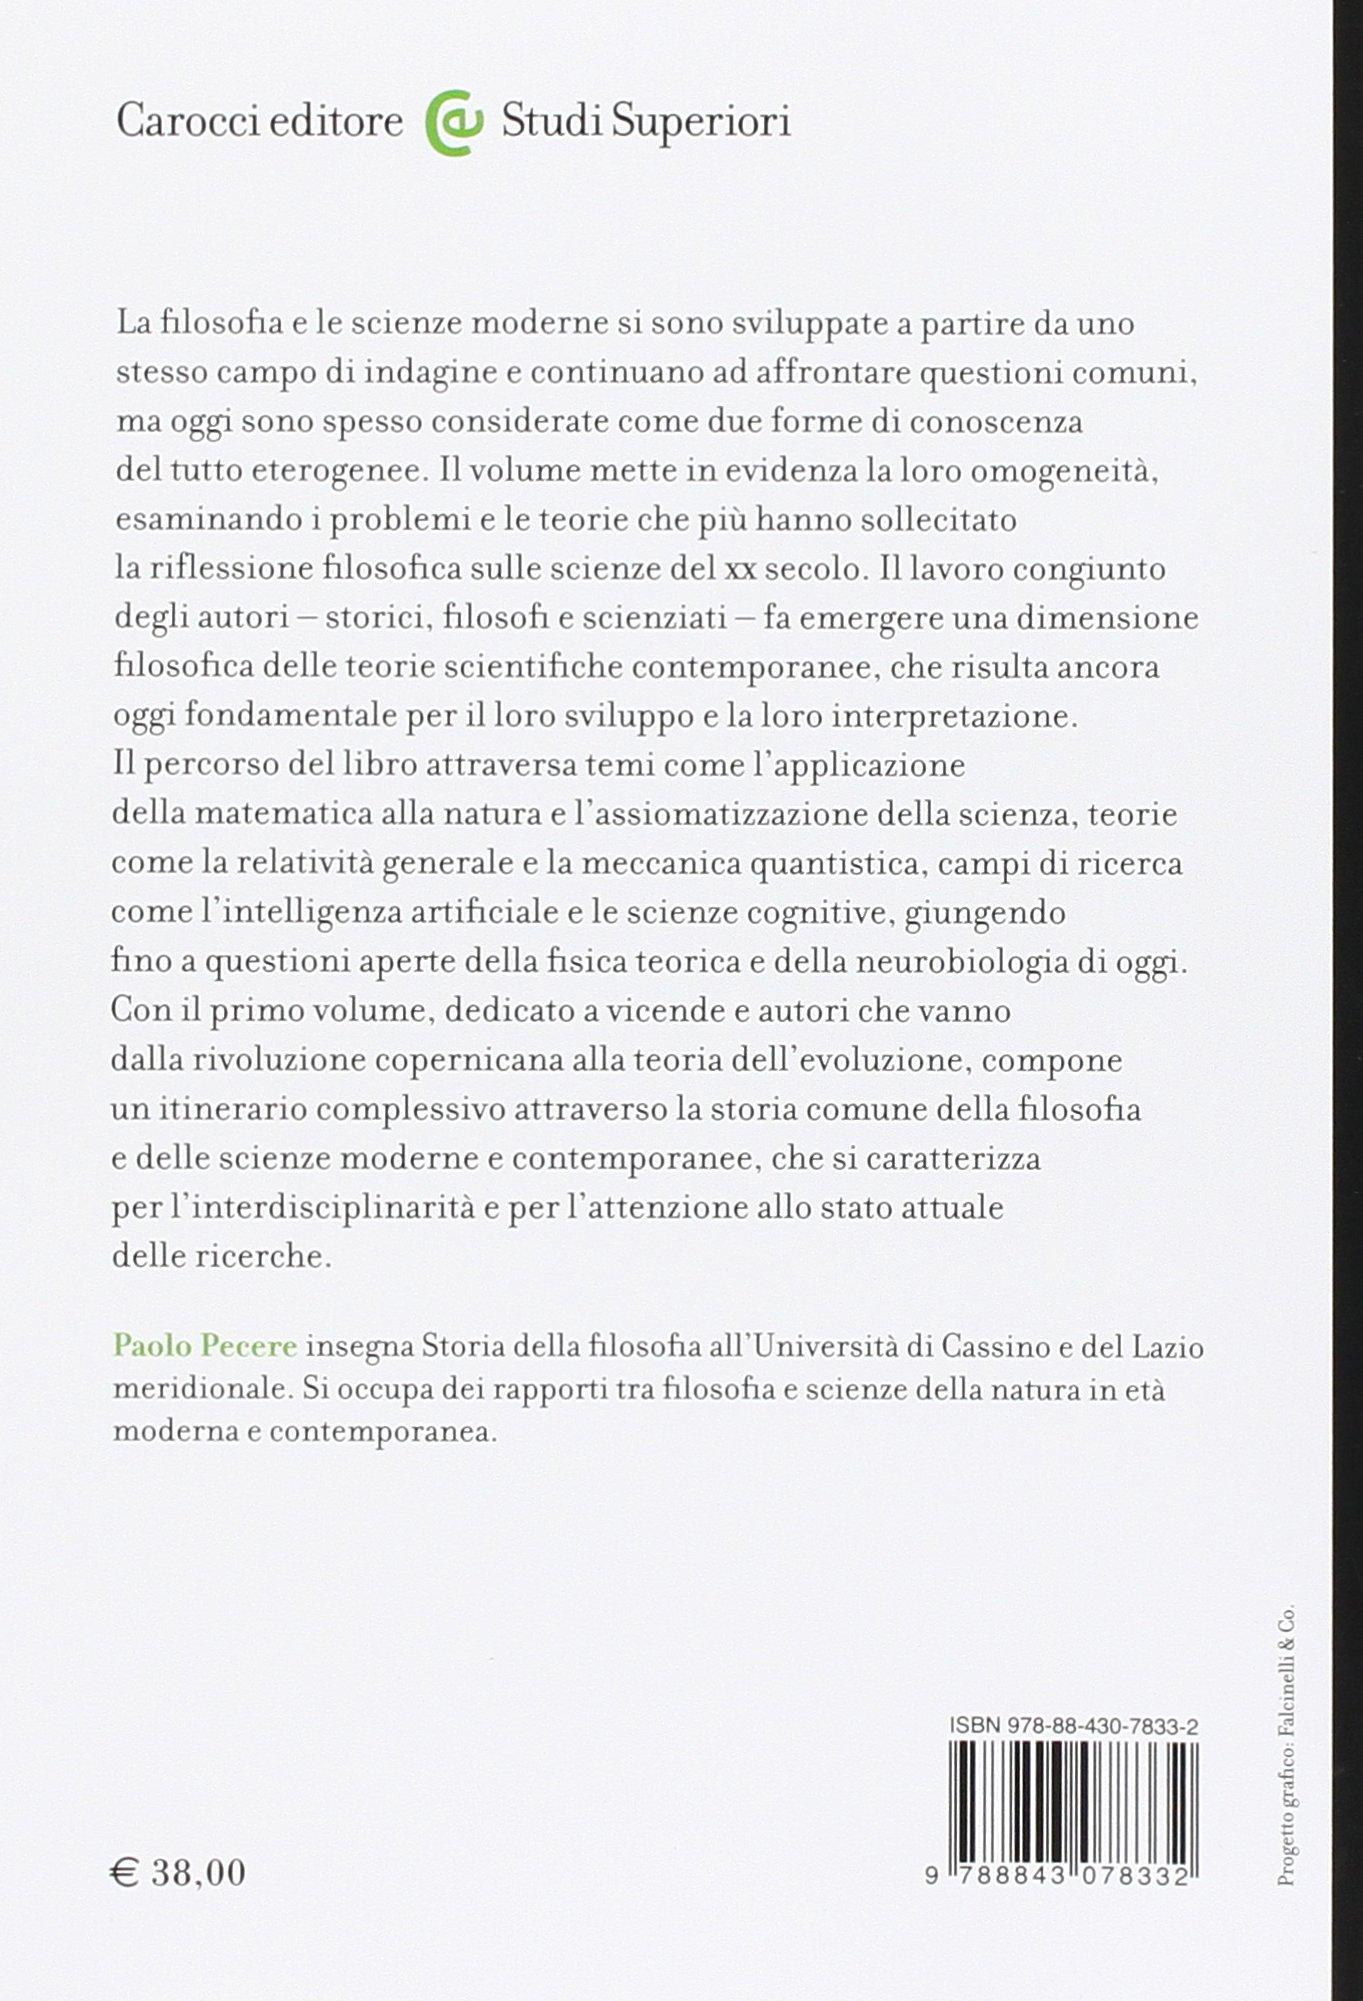 Il libro della natura: 2 (Studi superiori): Amazon.es: P. Pecere: Libros en idiomas extranjeros